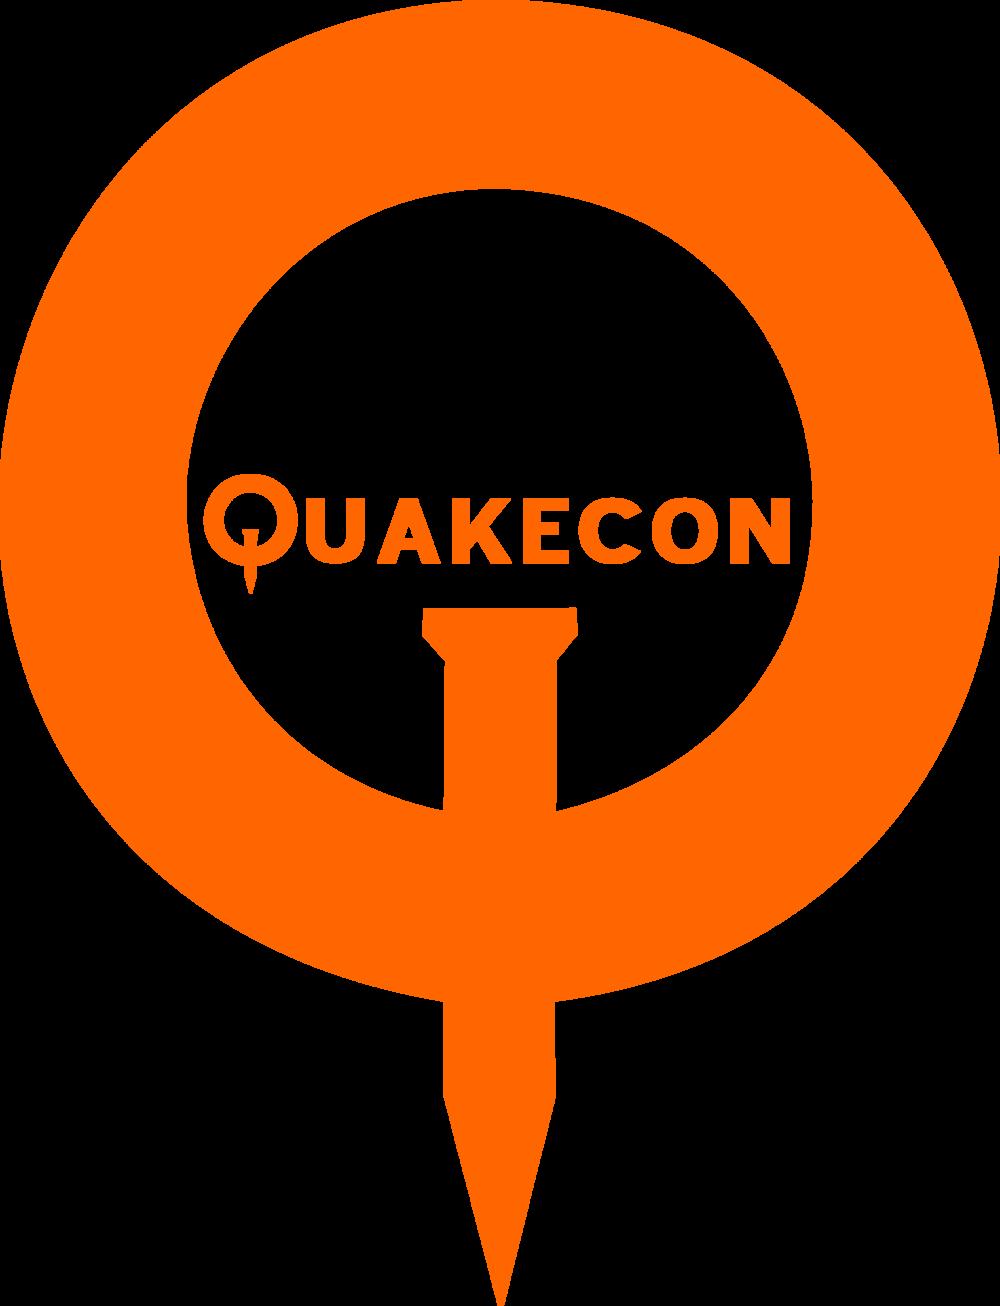 quakecon.png